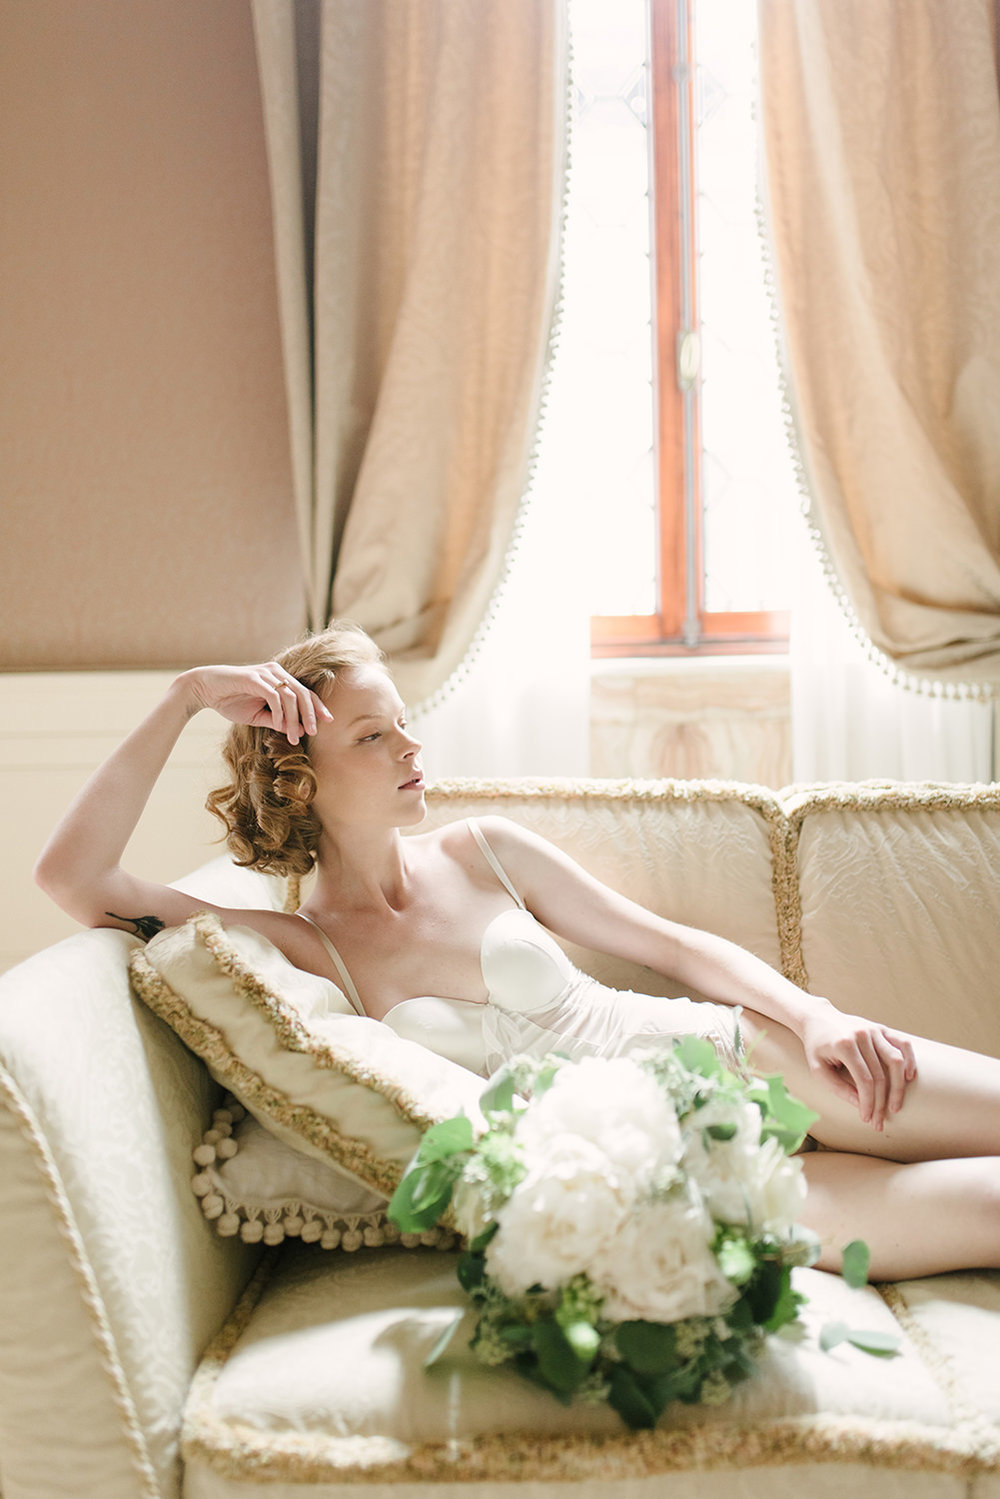 elopement-in-venice-F&G-©bottega53-3.JPG